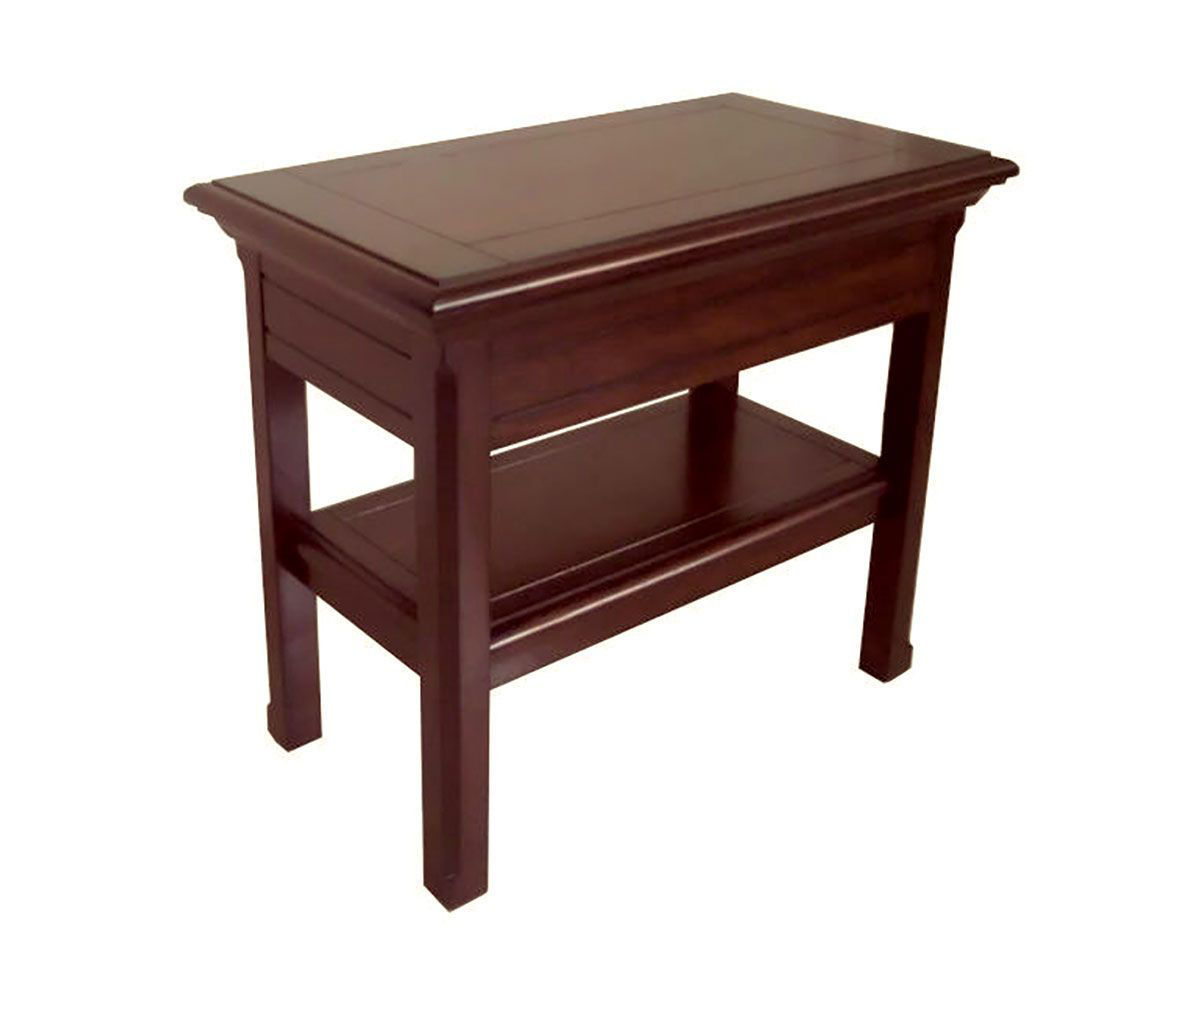 Picture of HAMILTON PARK END TABLE